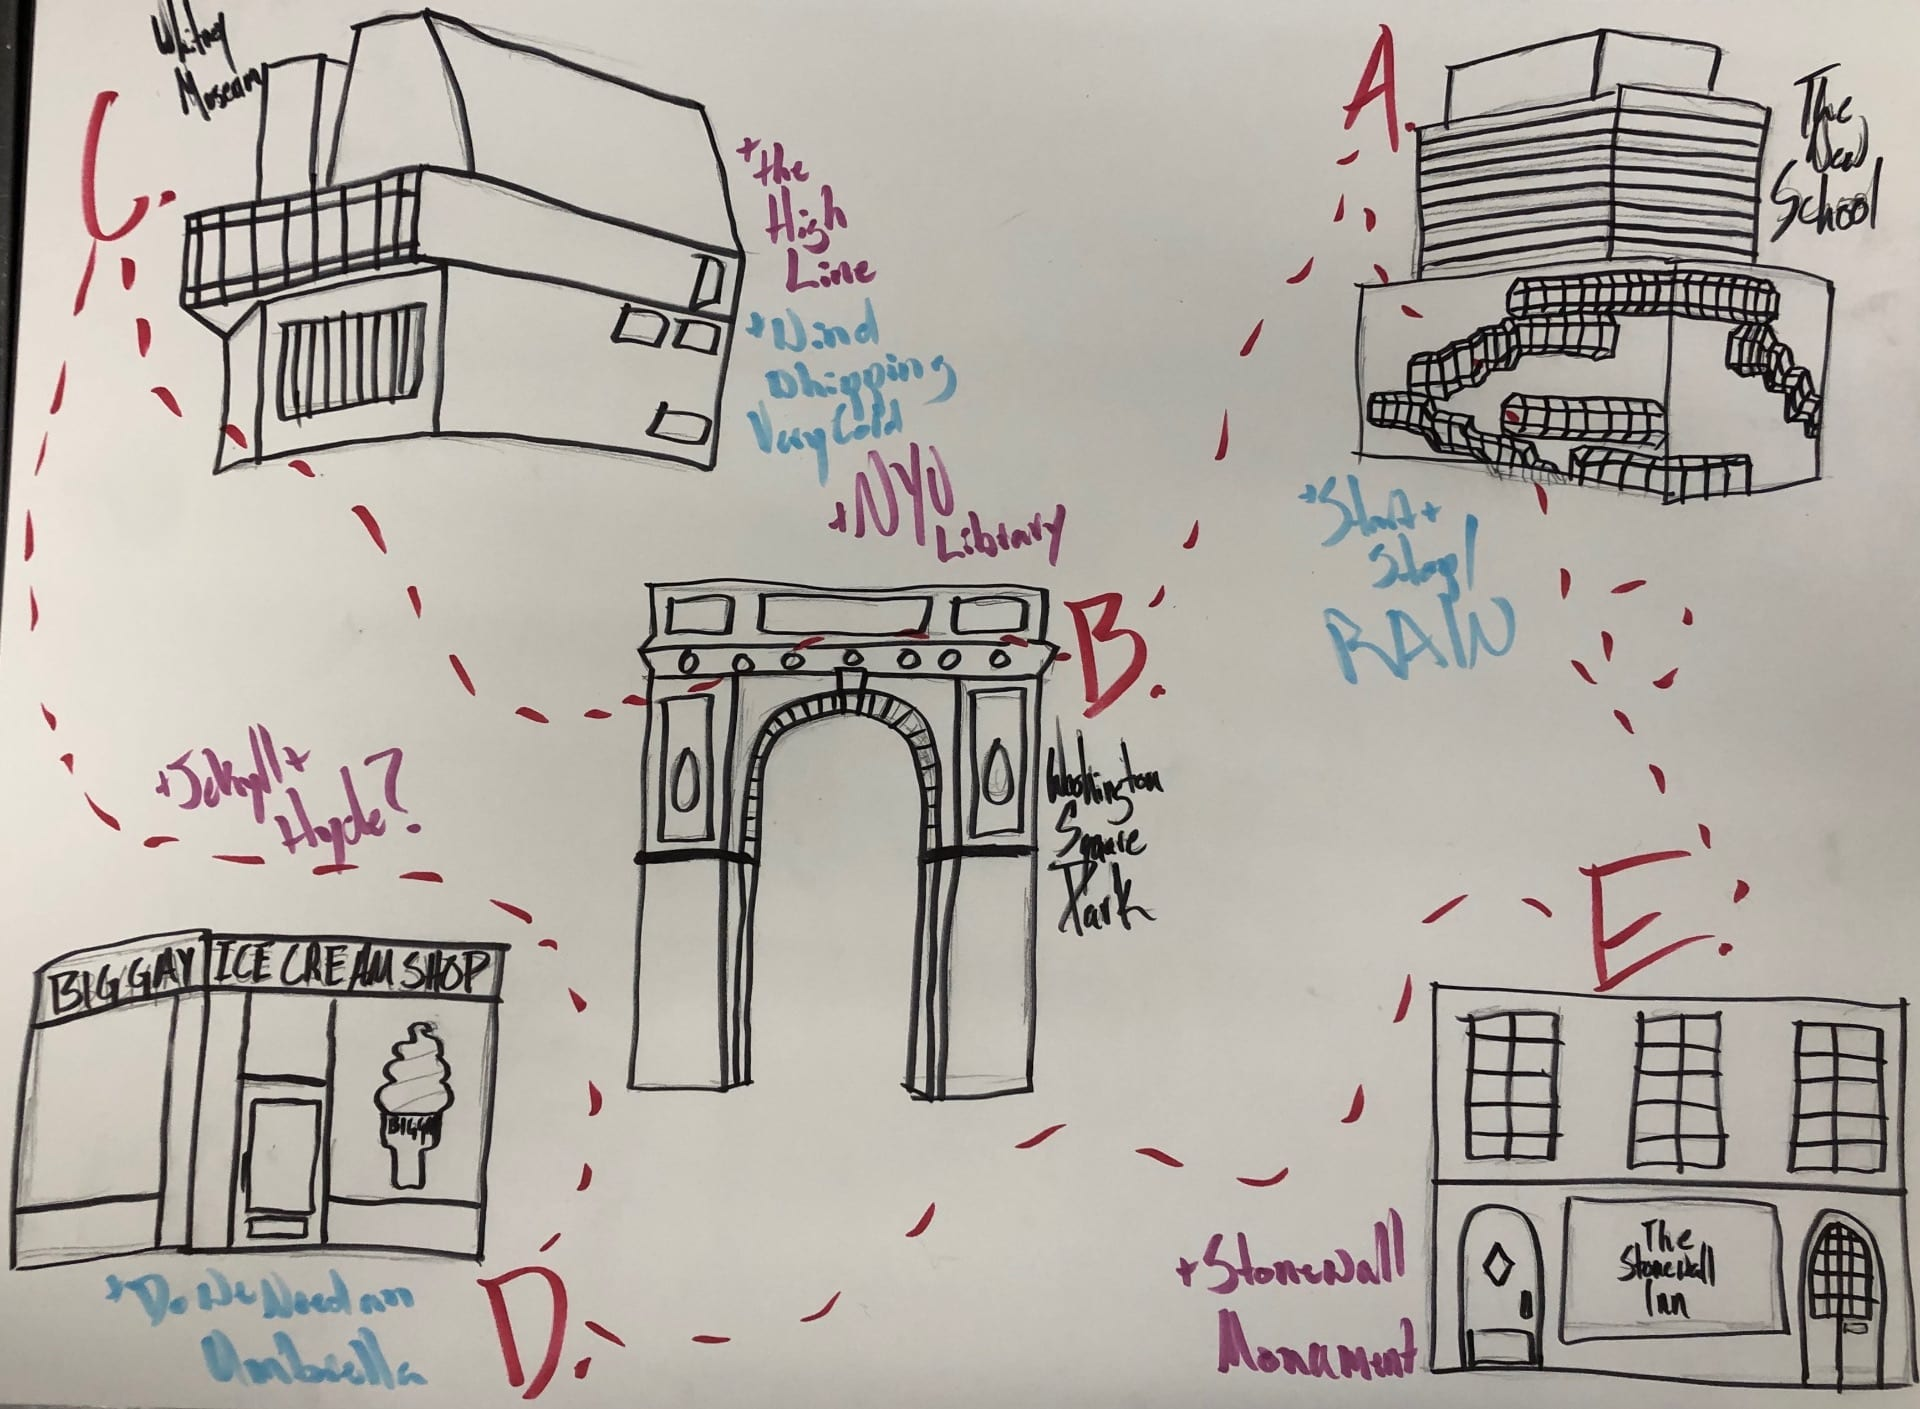 Psychogeographic Map Greenwich Village Nov. 30, 2018